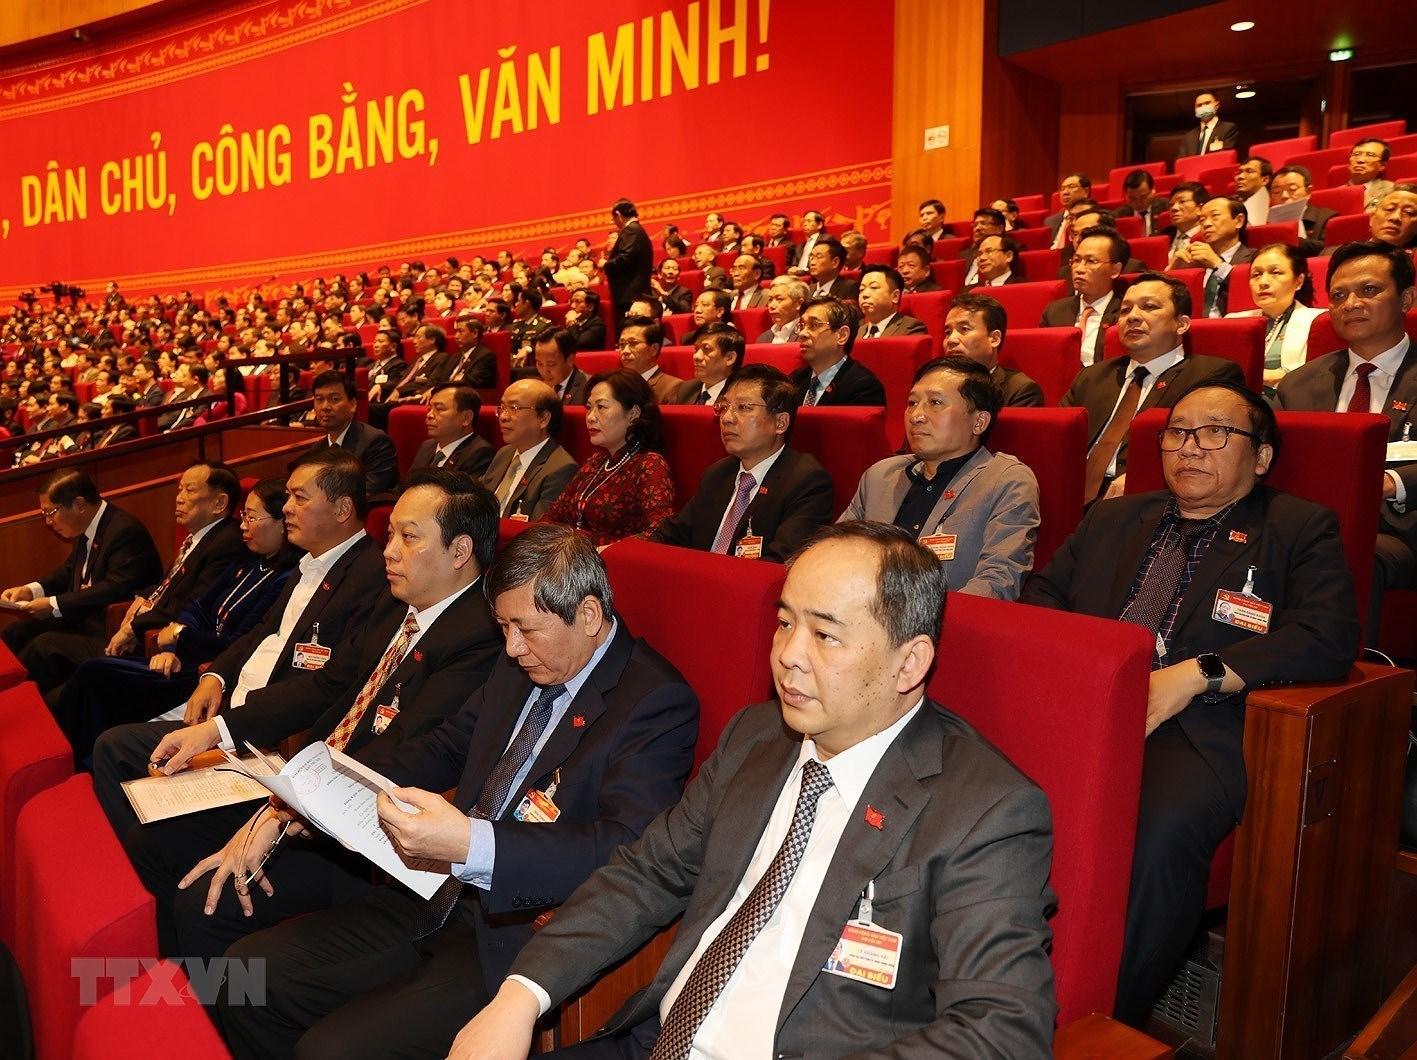 [Photo] Quang canh phien thao luan cac van kien Dai hoi XIII cua Dang hinh anh 10